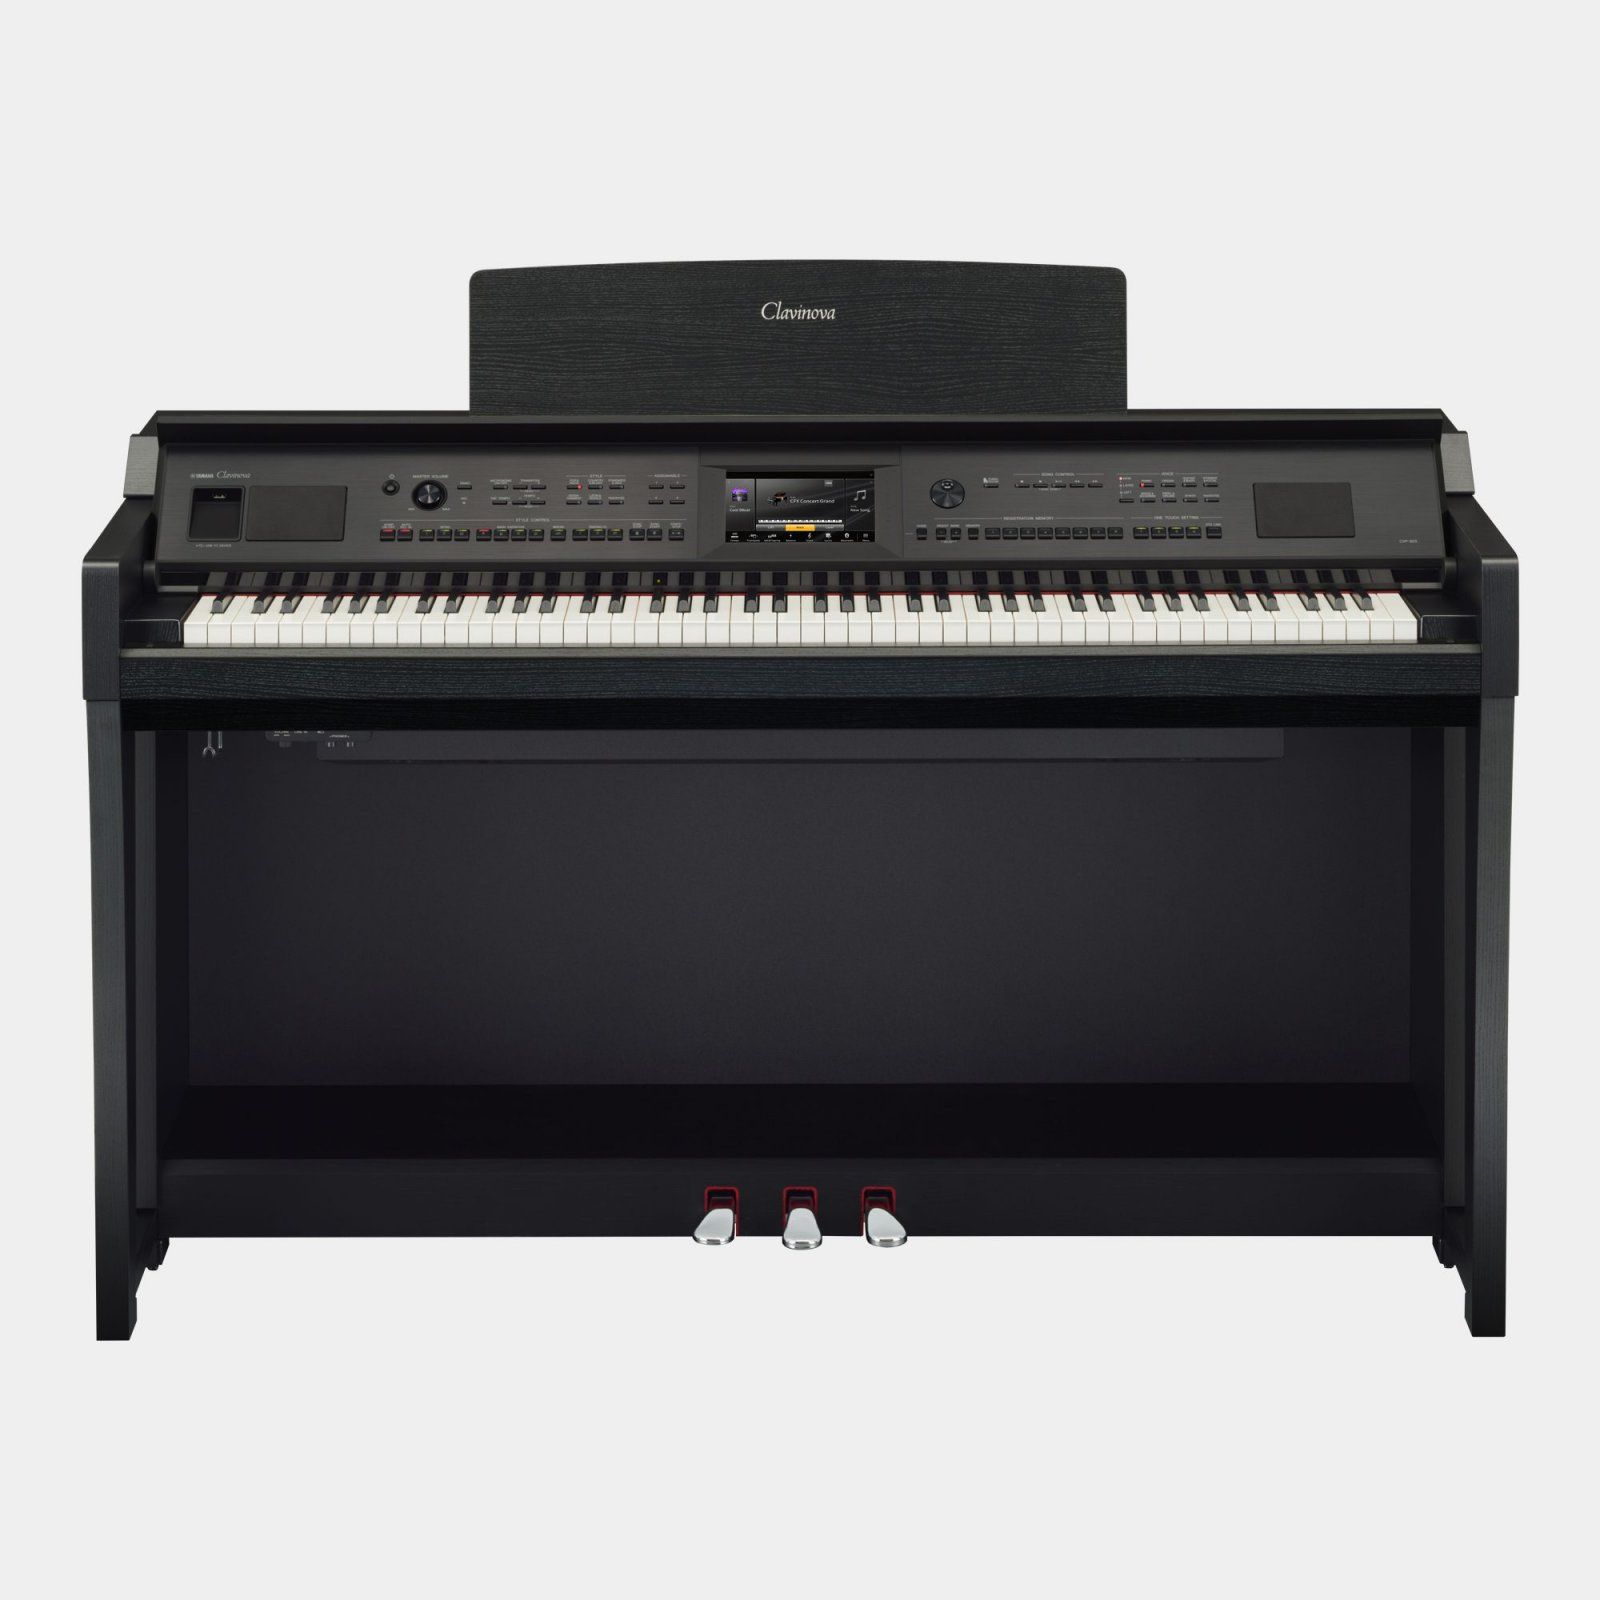 CVP805 Clavinova Digital Piano